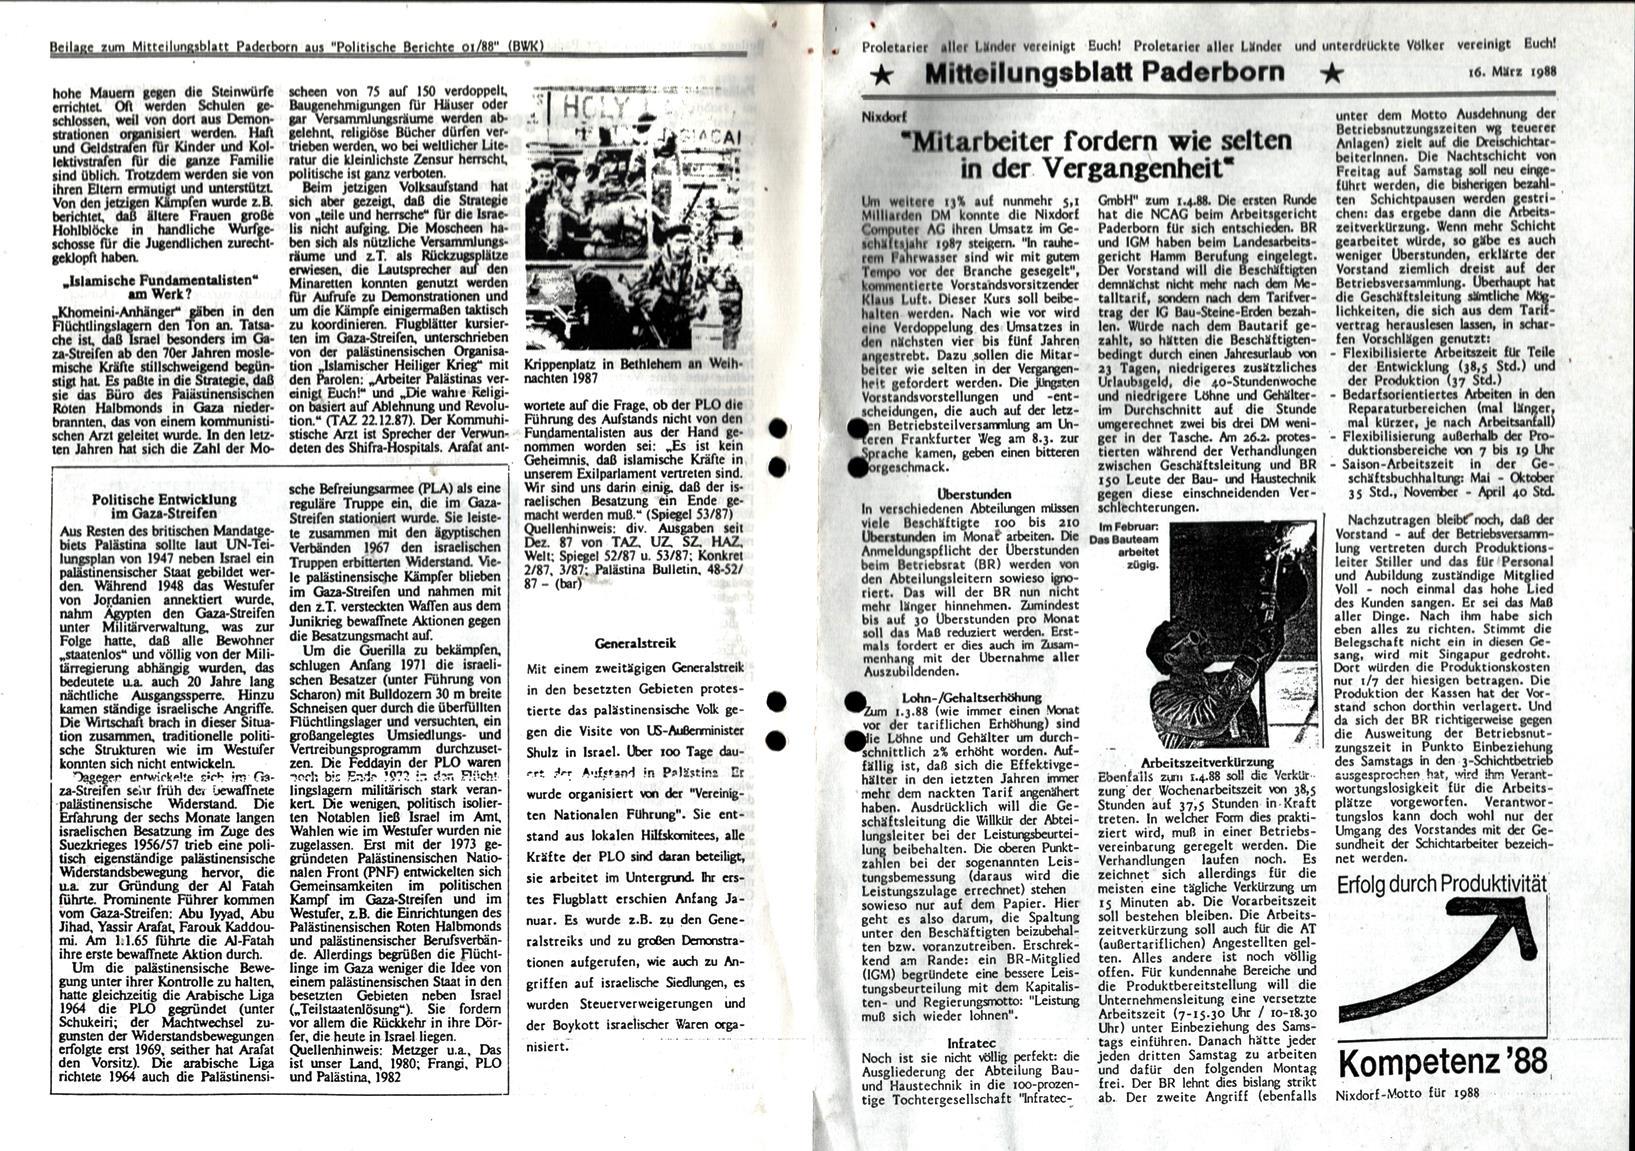 Paderborn_BWK_Mitteilungsblatt_19880316_001